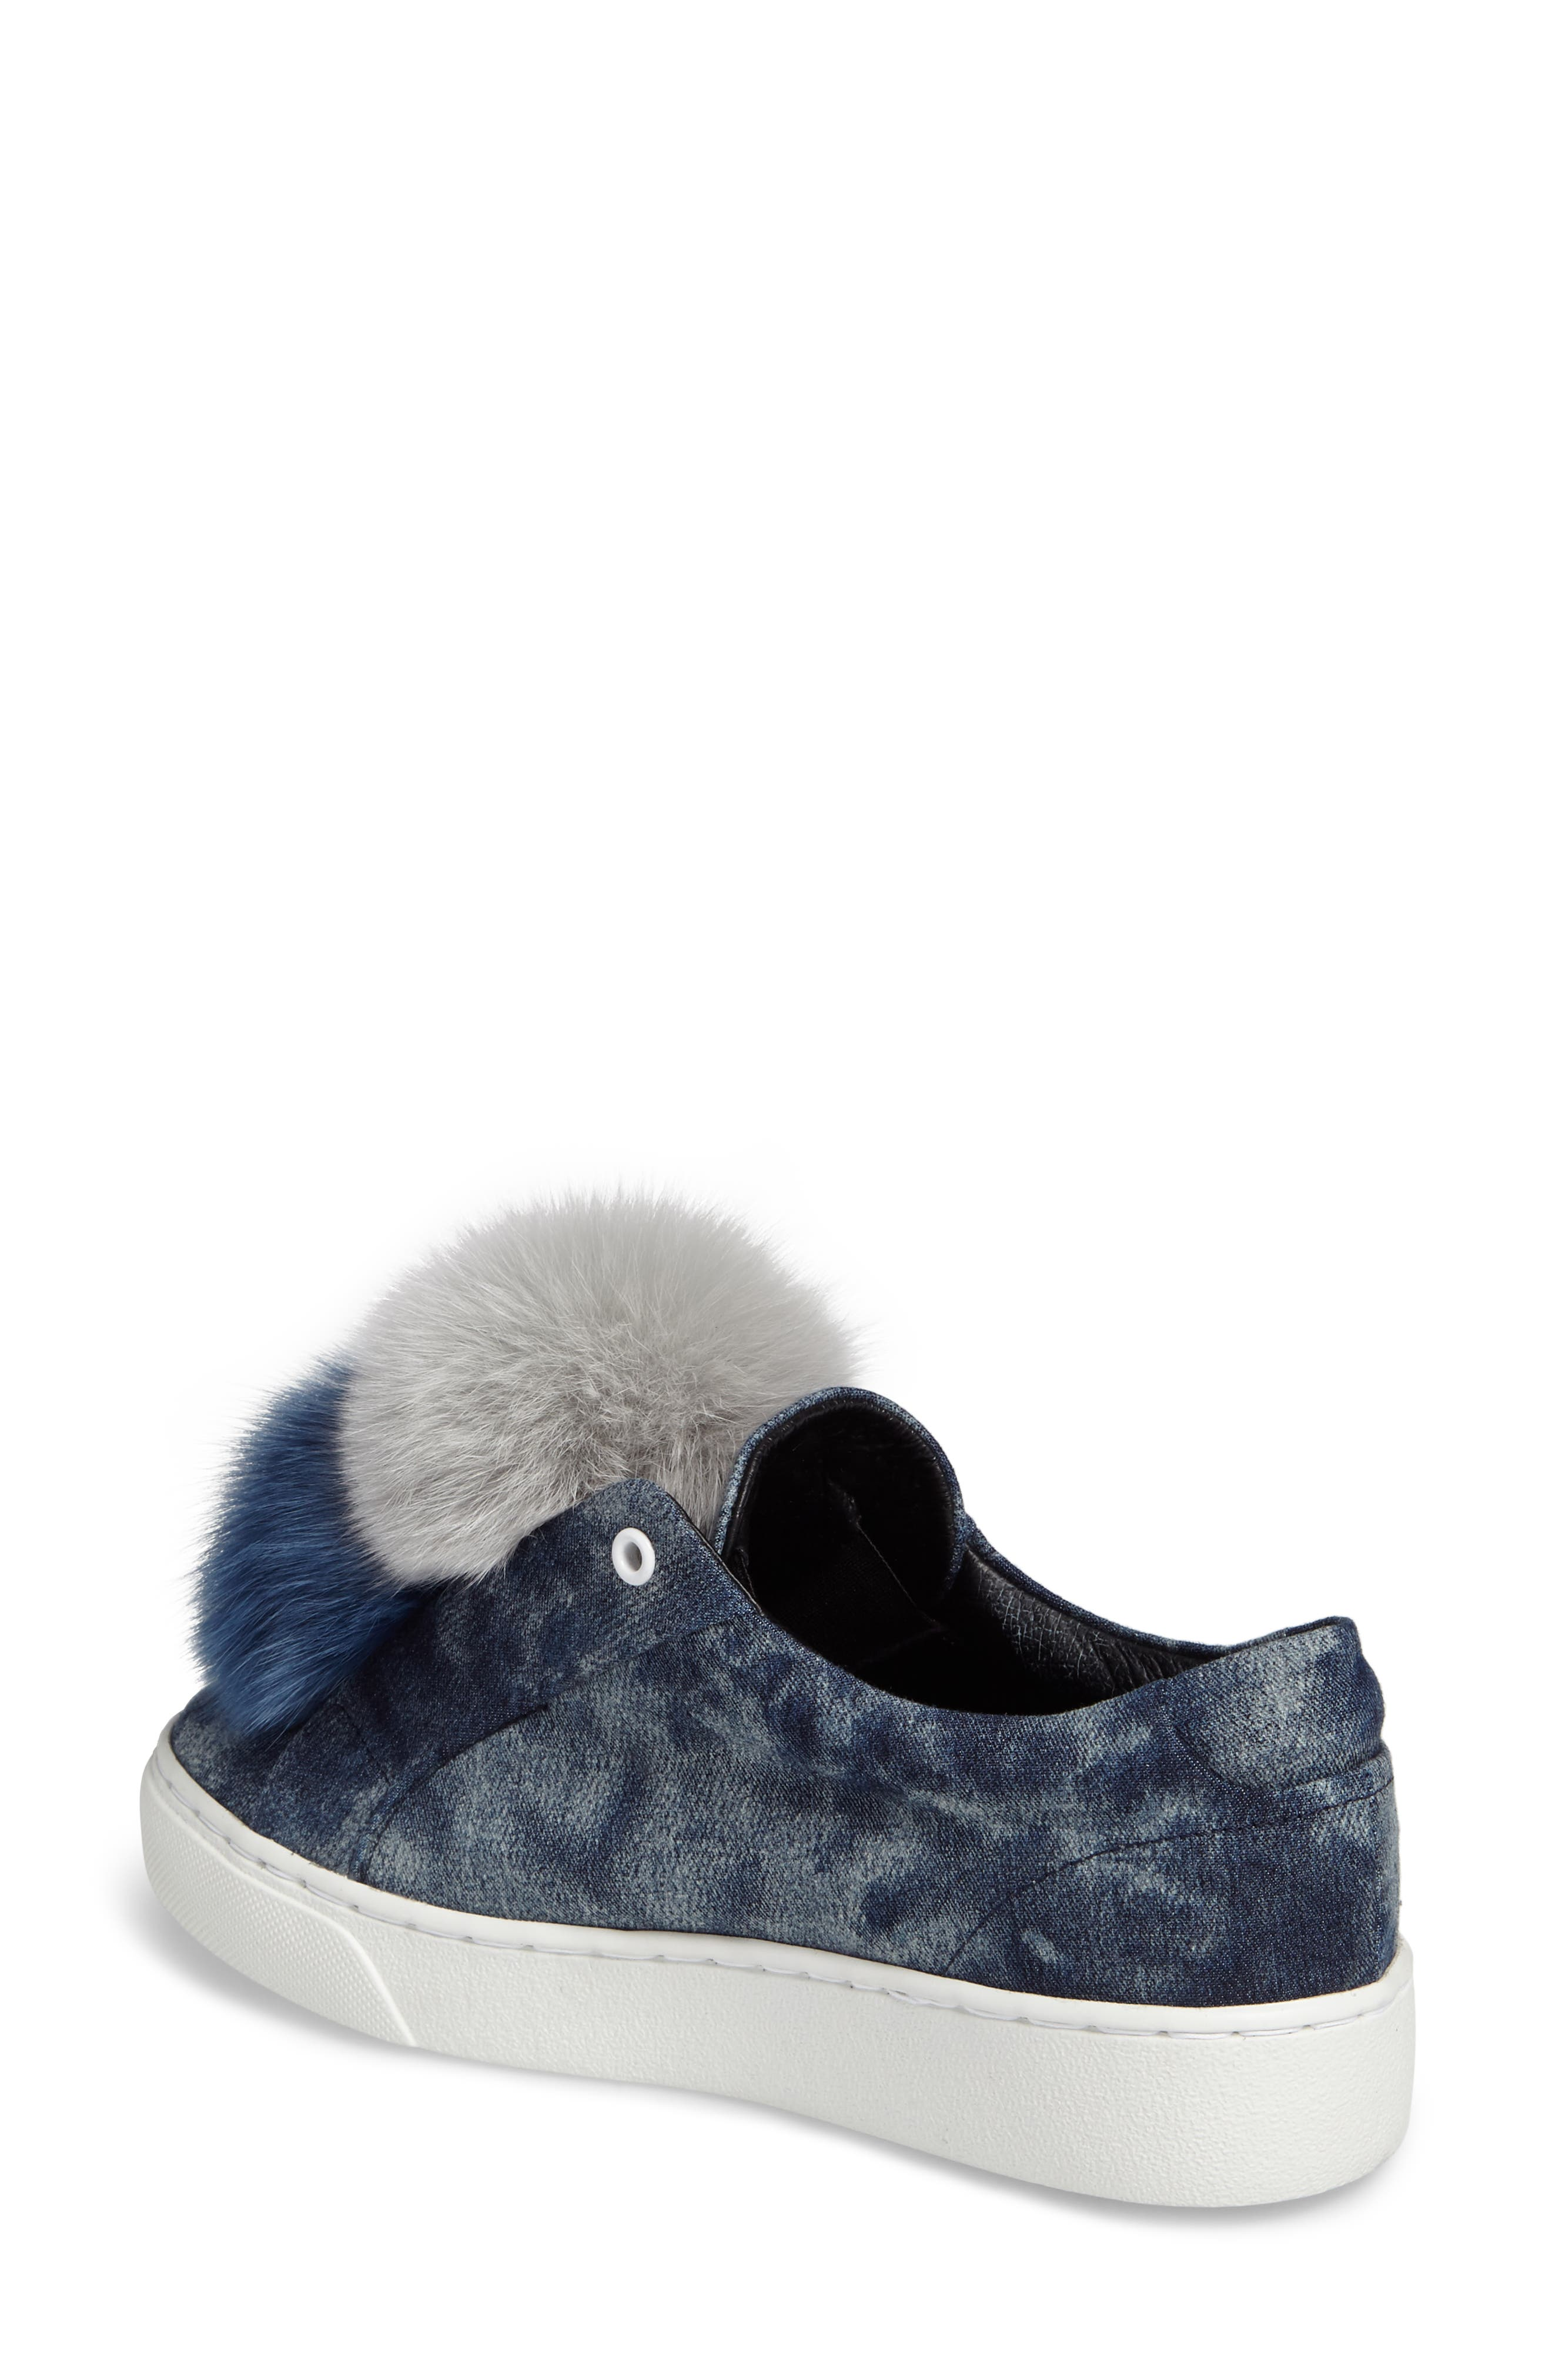 Joey Genuine Fox Fur Trim Sneaker,                             Alternate thumbnail 2, color,                             Blue Tiedye Denim